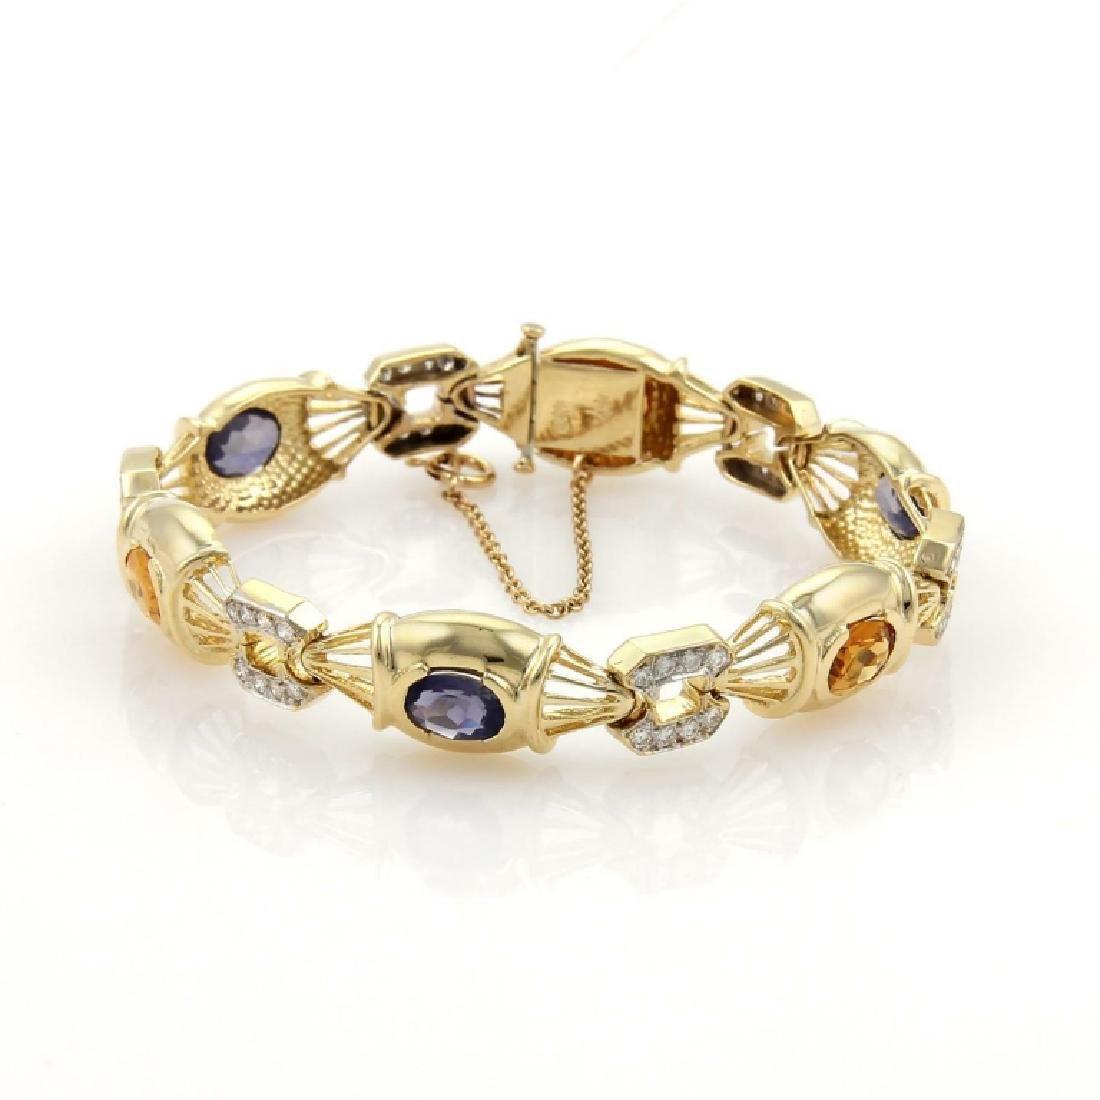 7.85ct Diamonds Iolite Citrine 14k YGold Bracelet